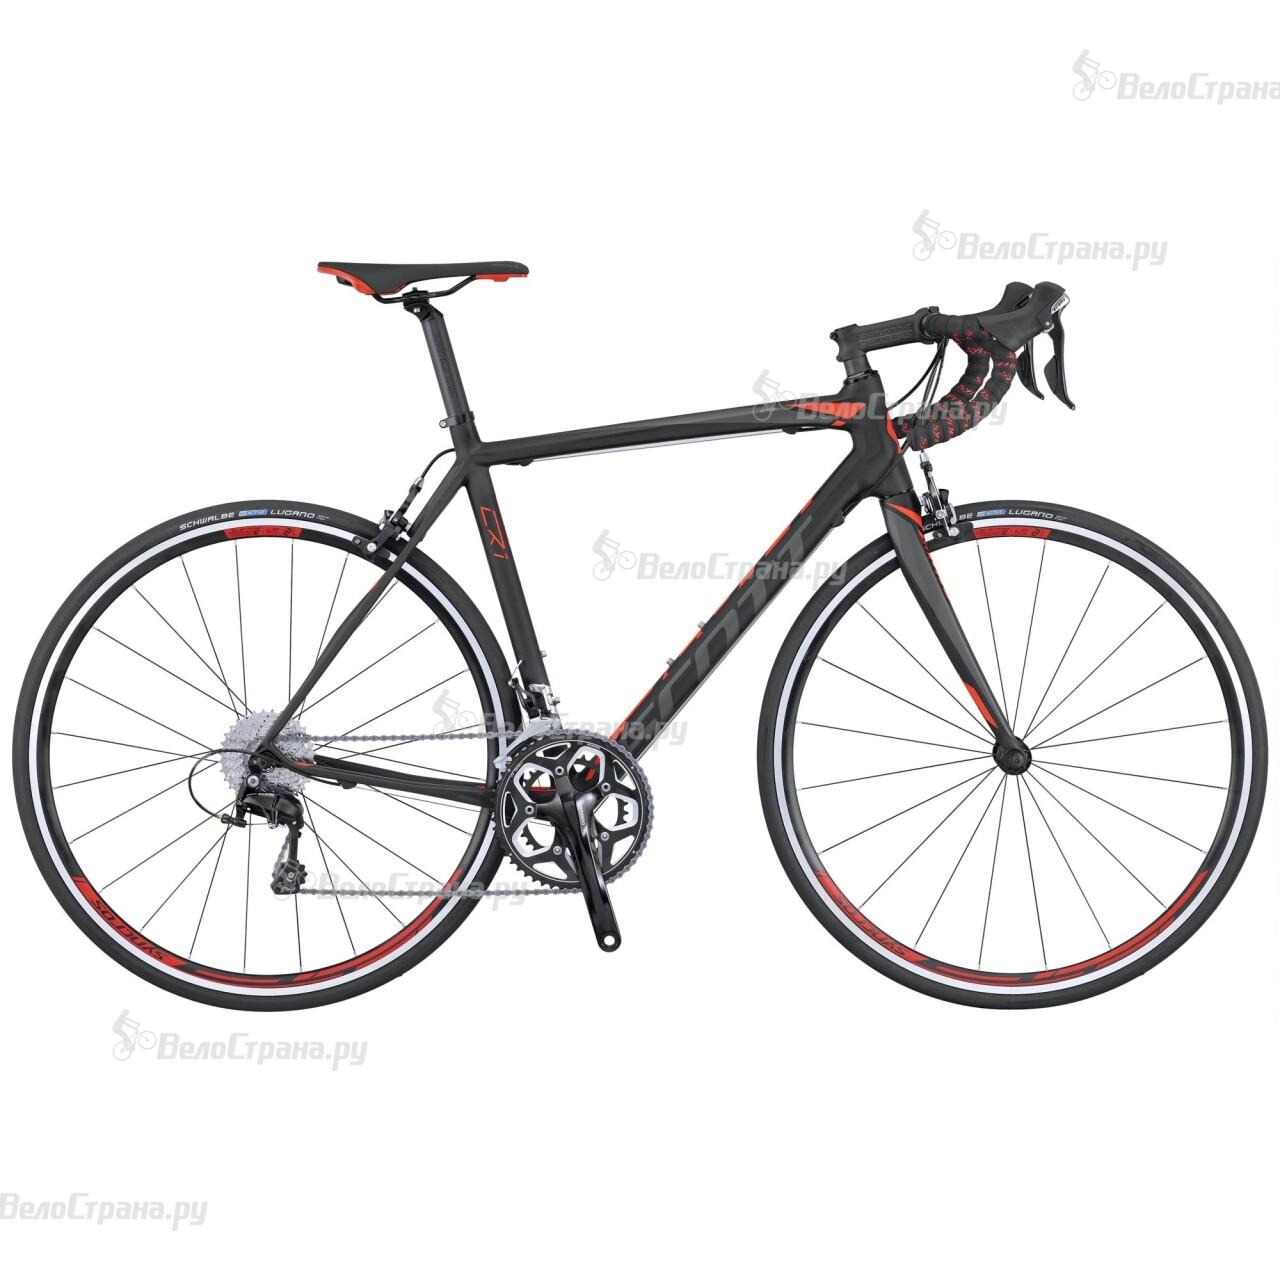 Велосипед Scott CR1 20 (2016)